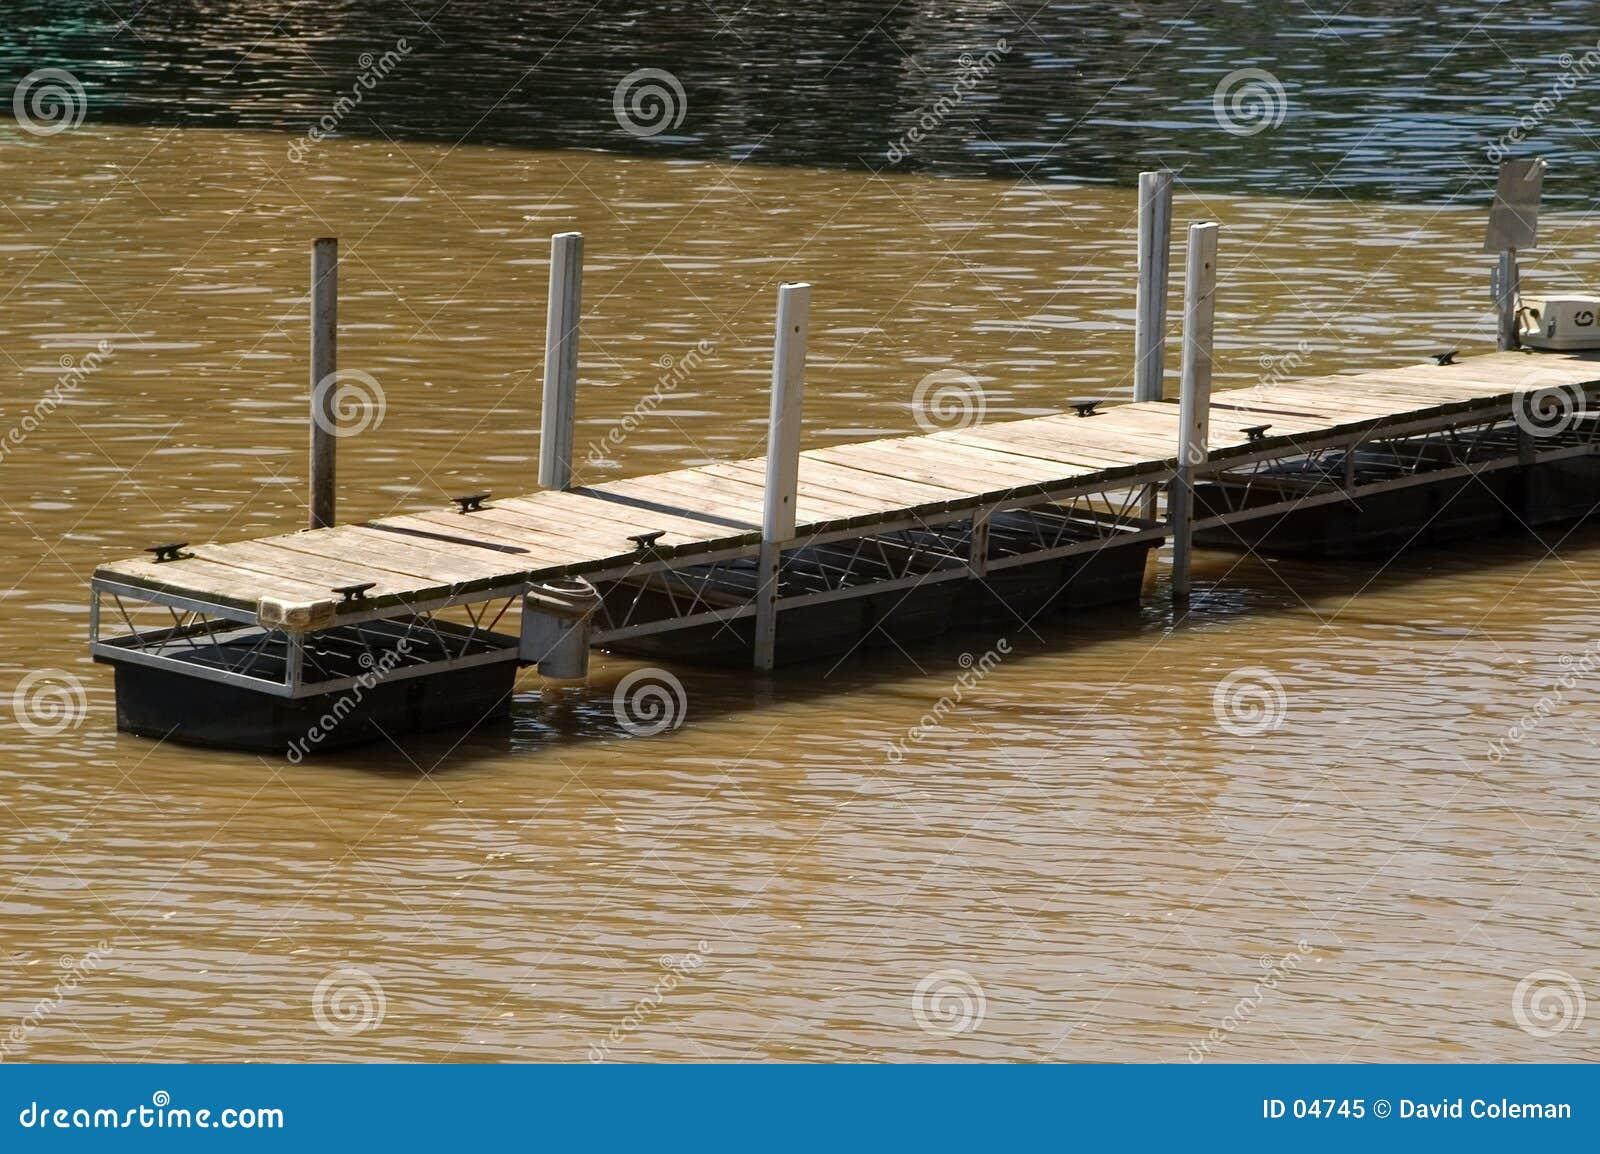 Dock in the River